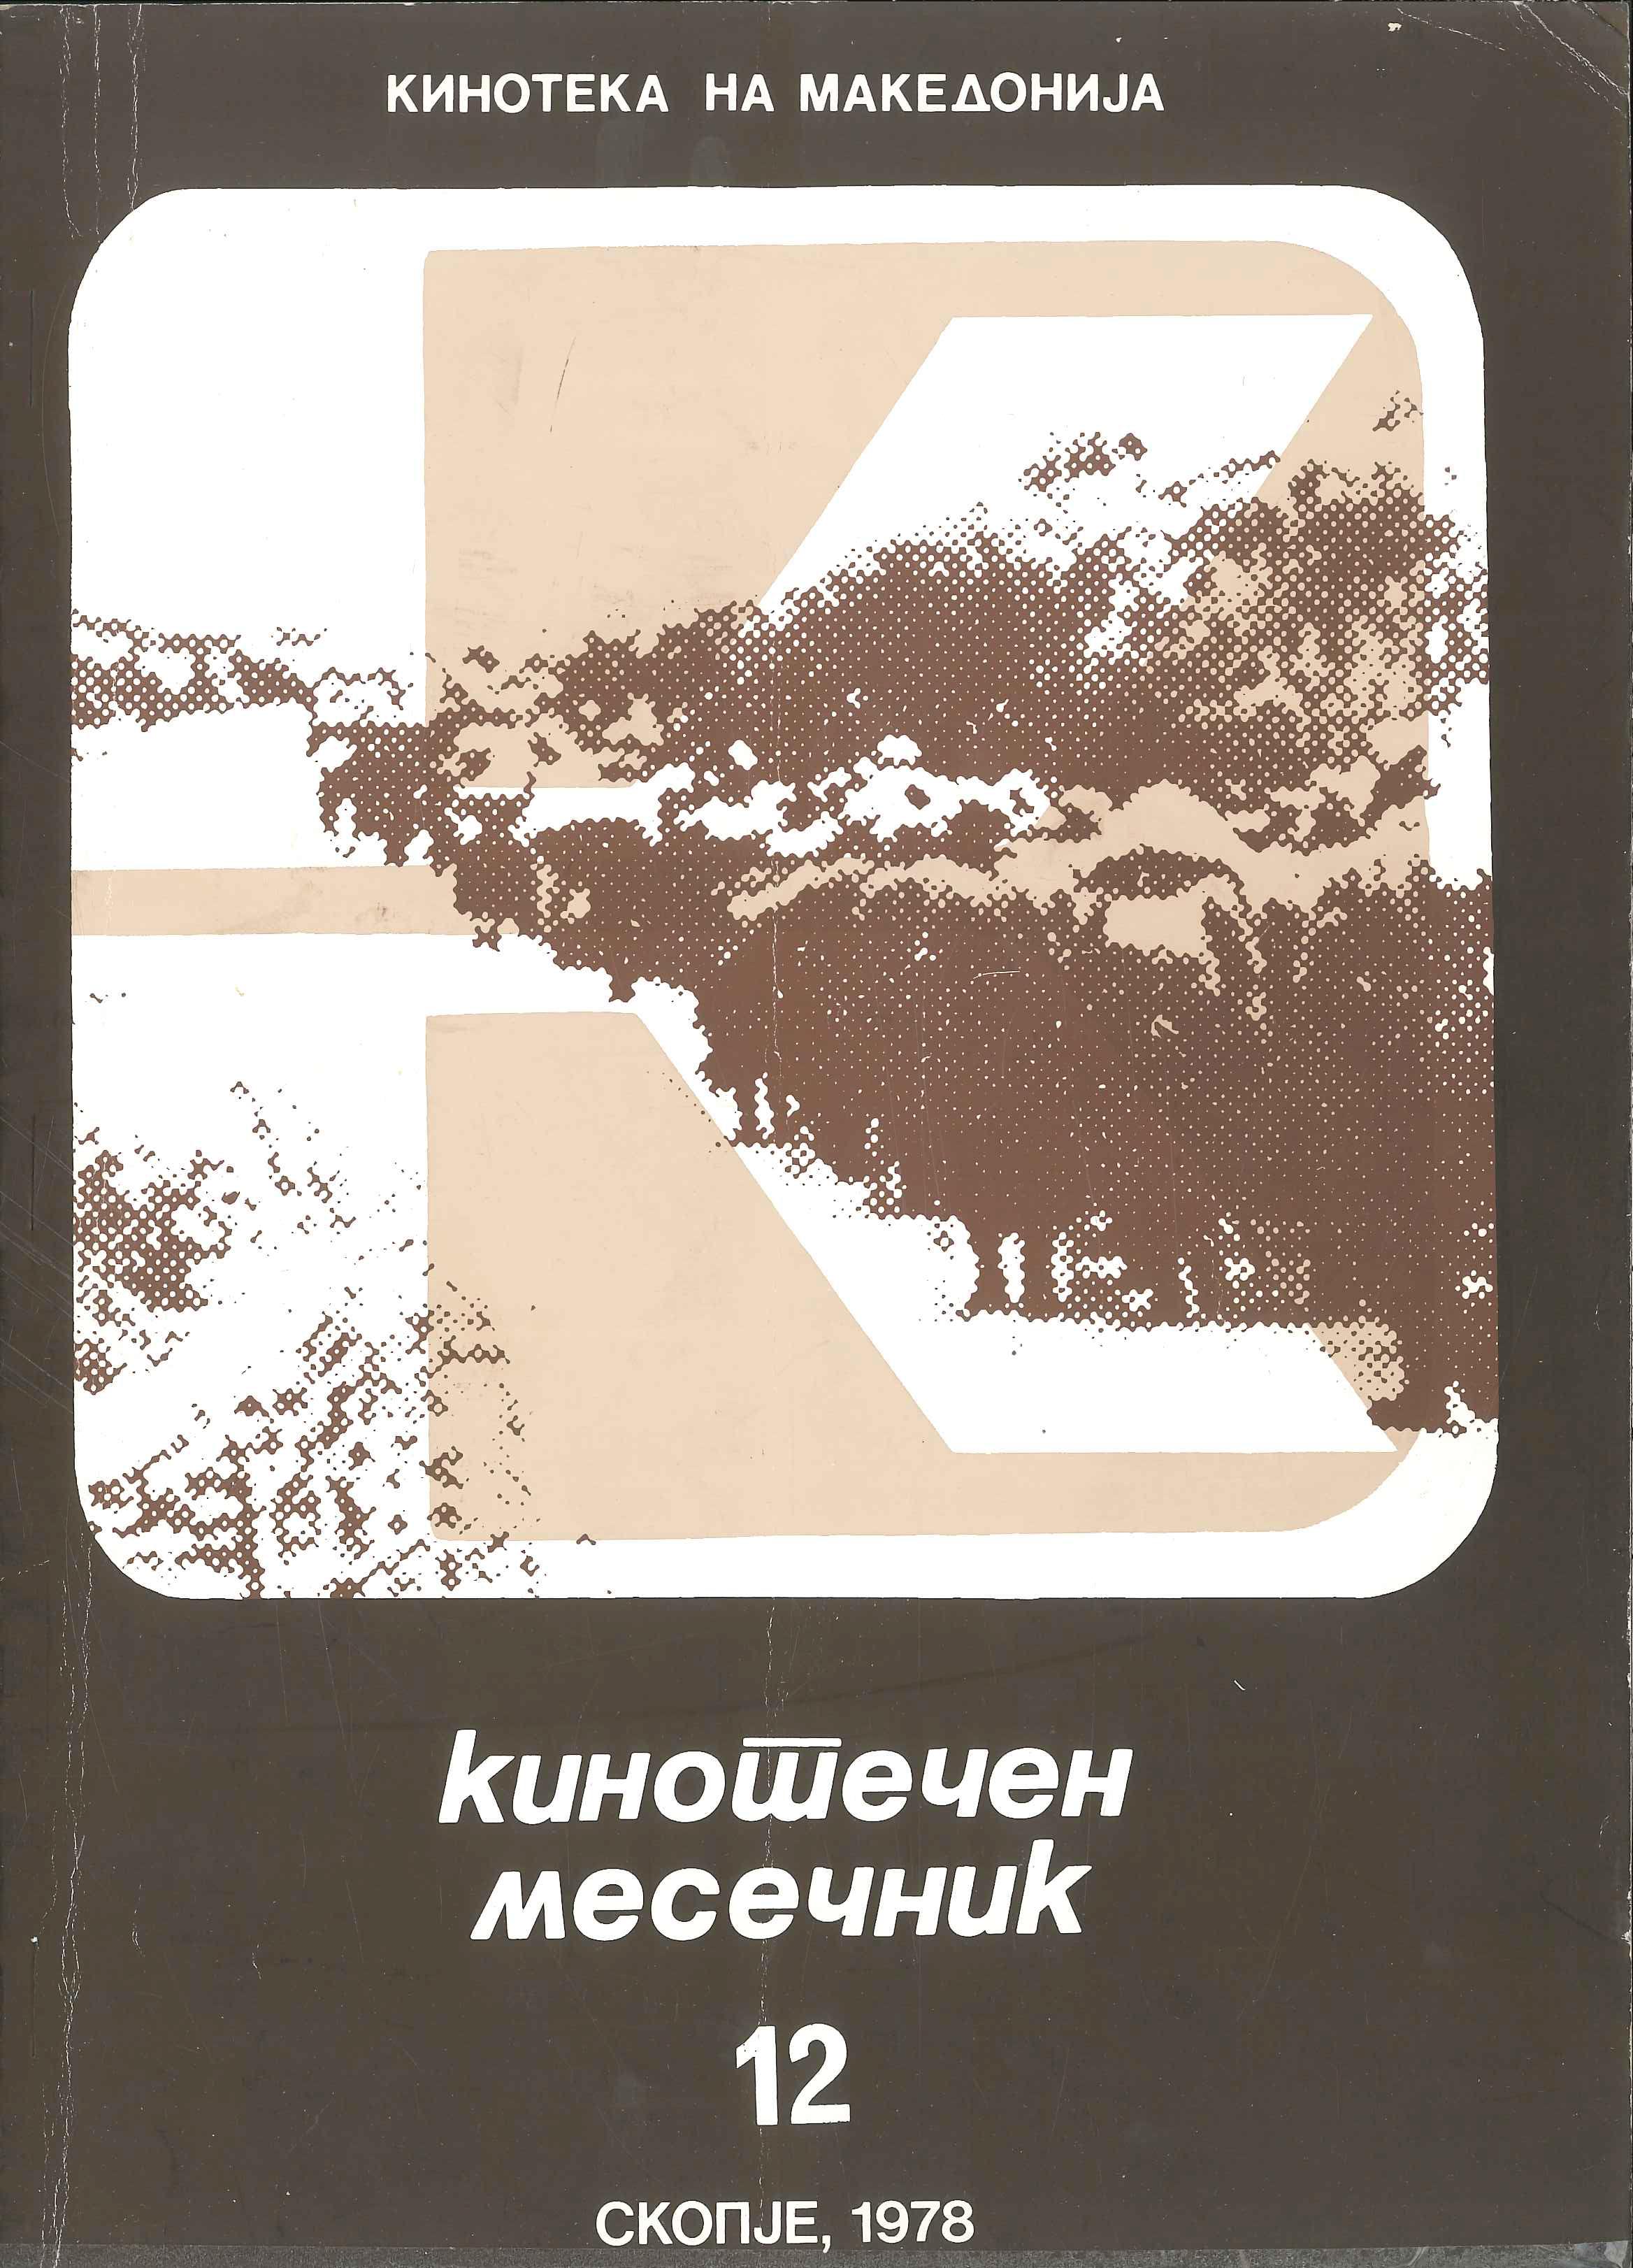 Кинотечен месечник бр. 12